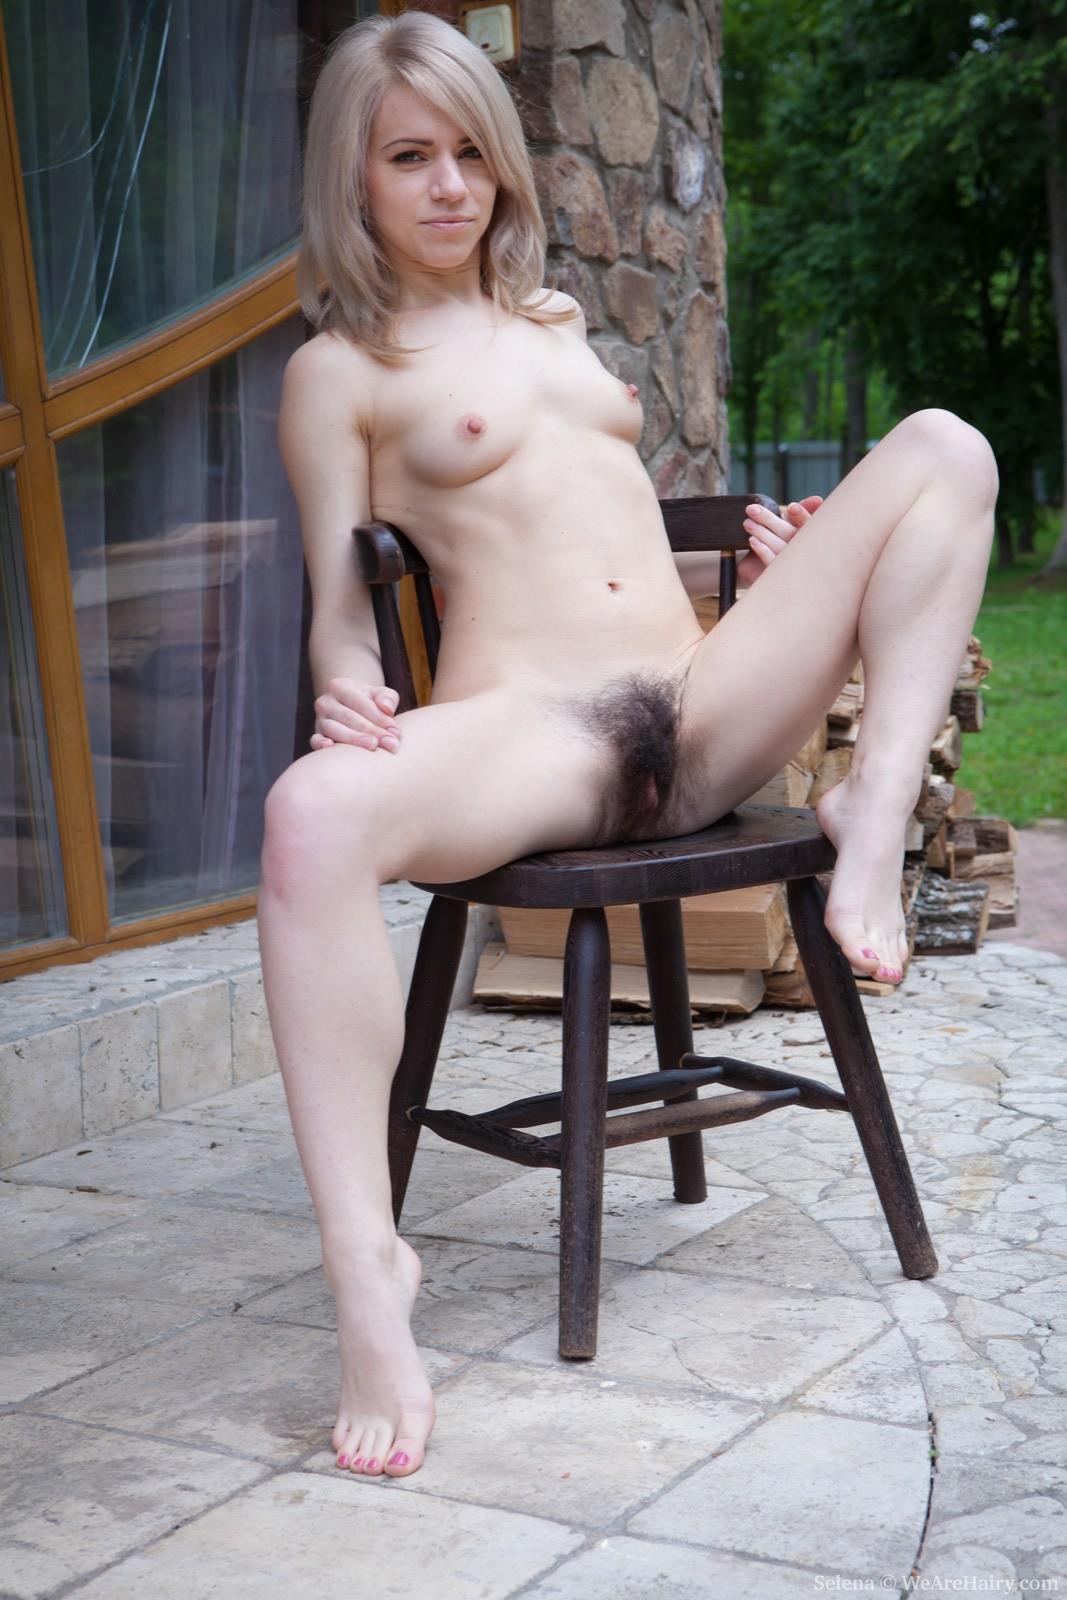 Women nude all beautiful natural